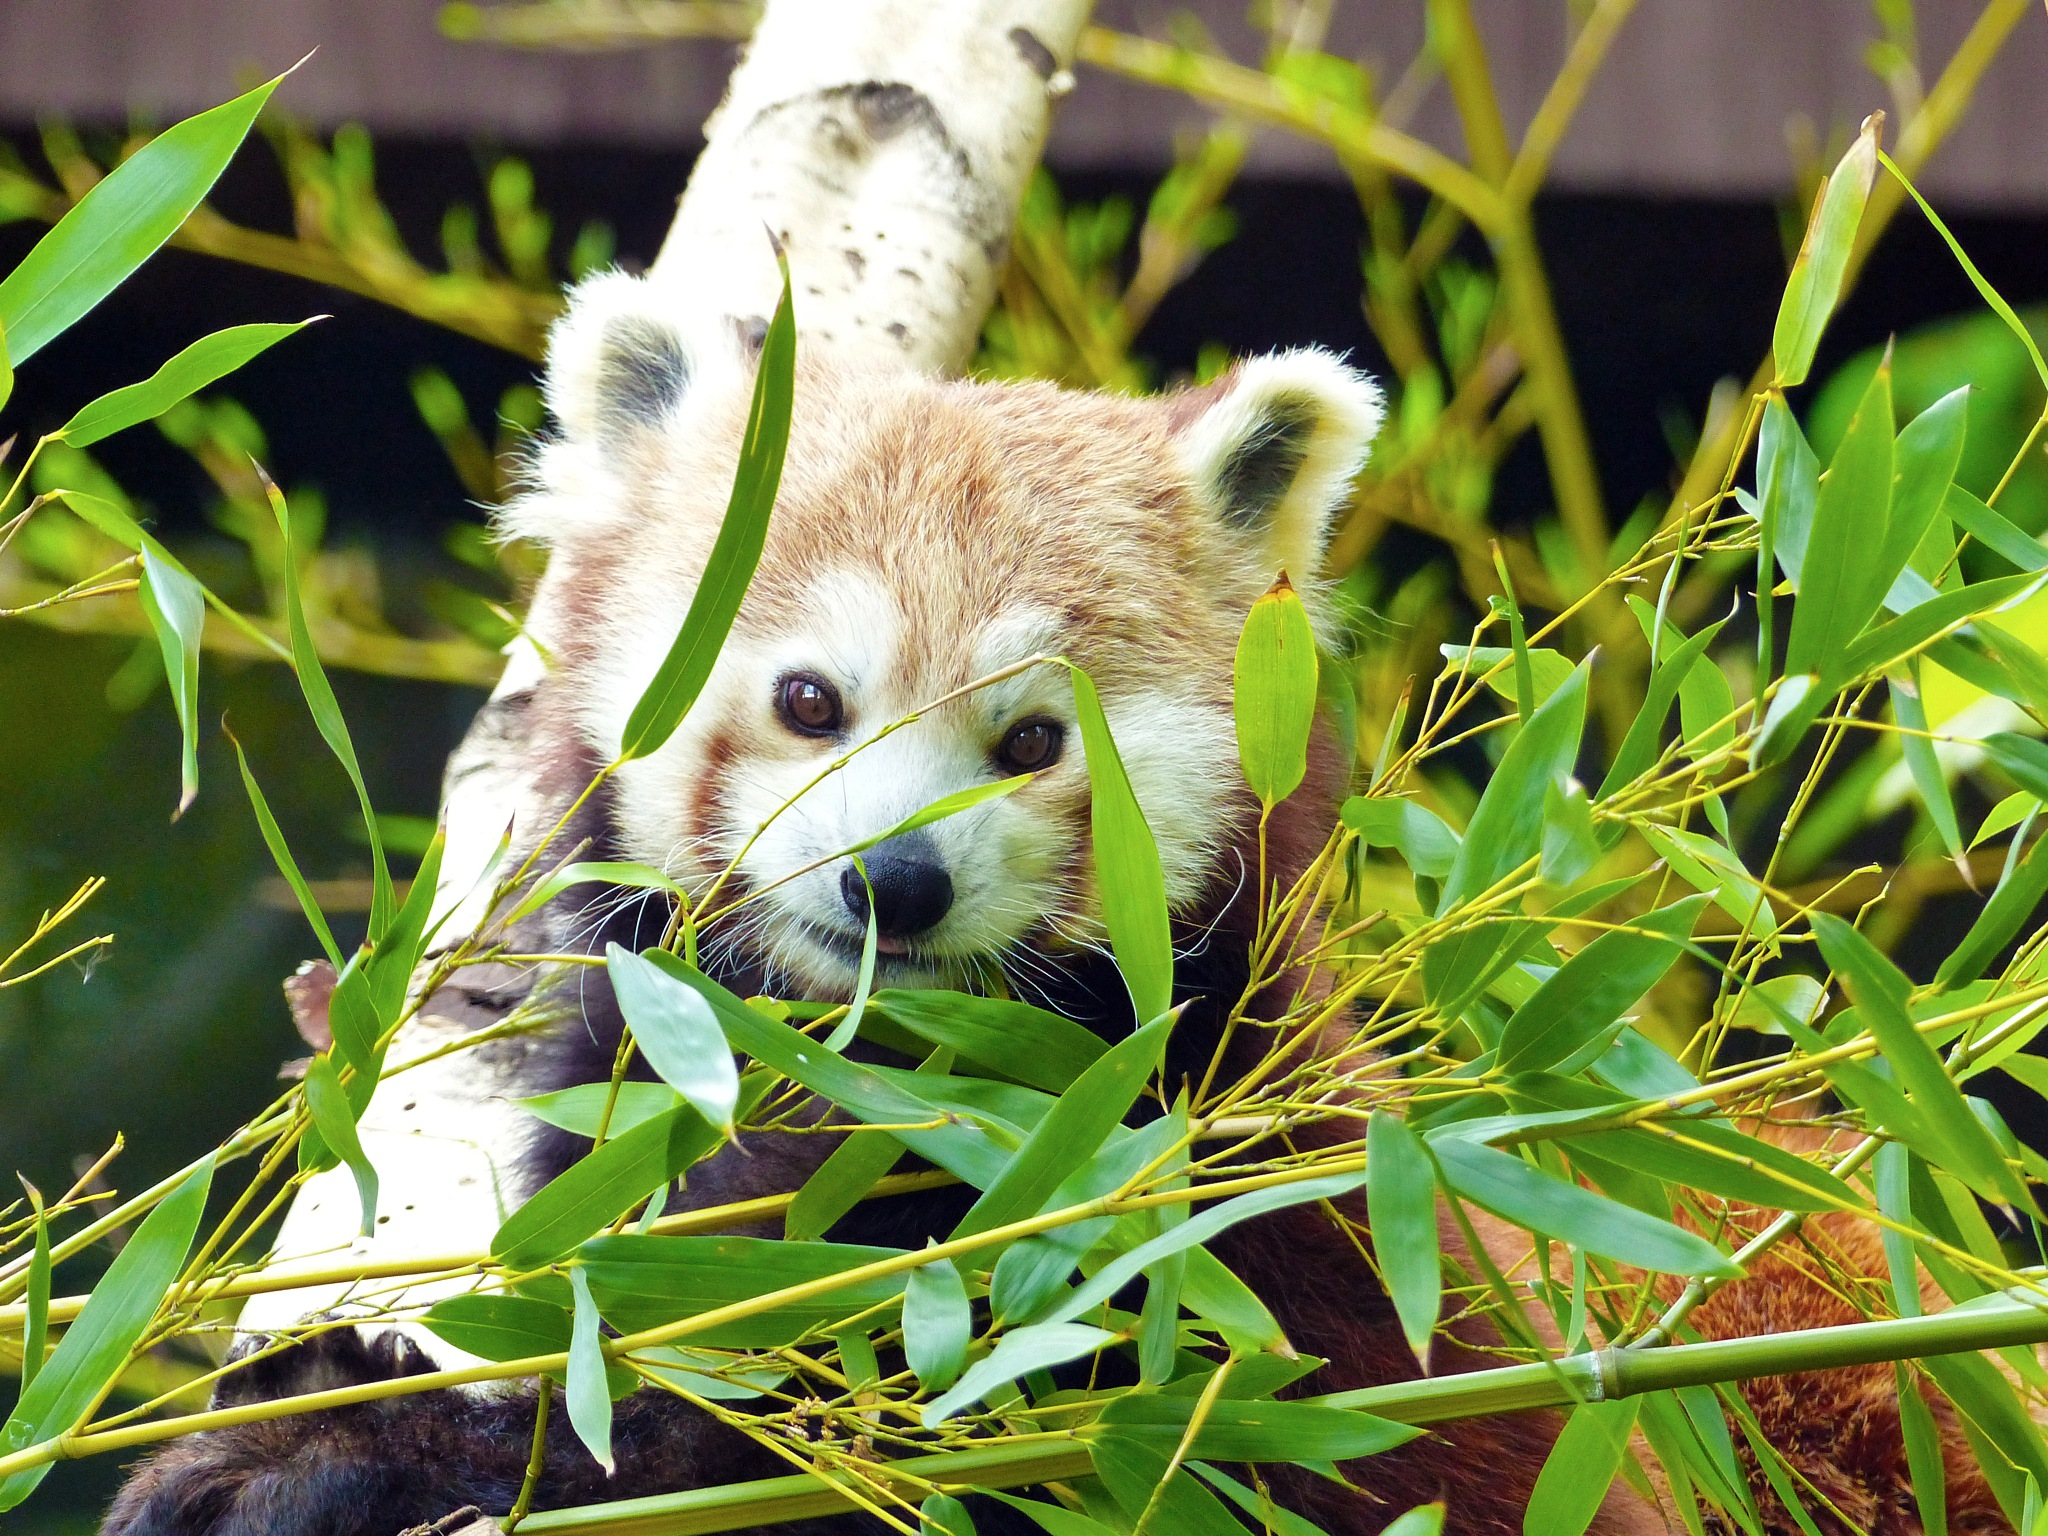 Red panda by Lilla Ondok